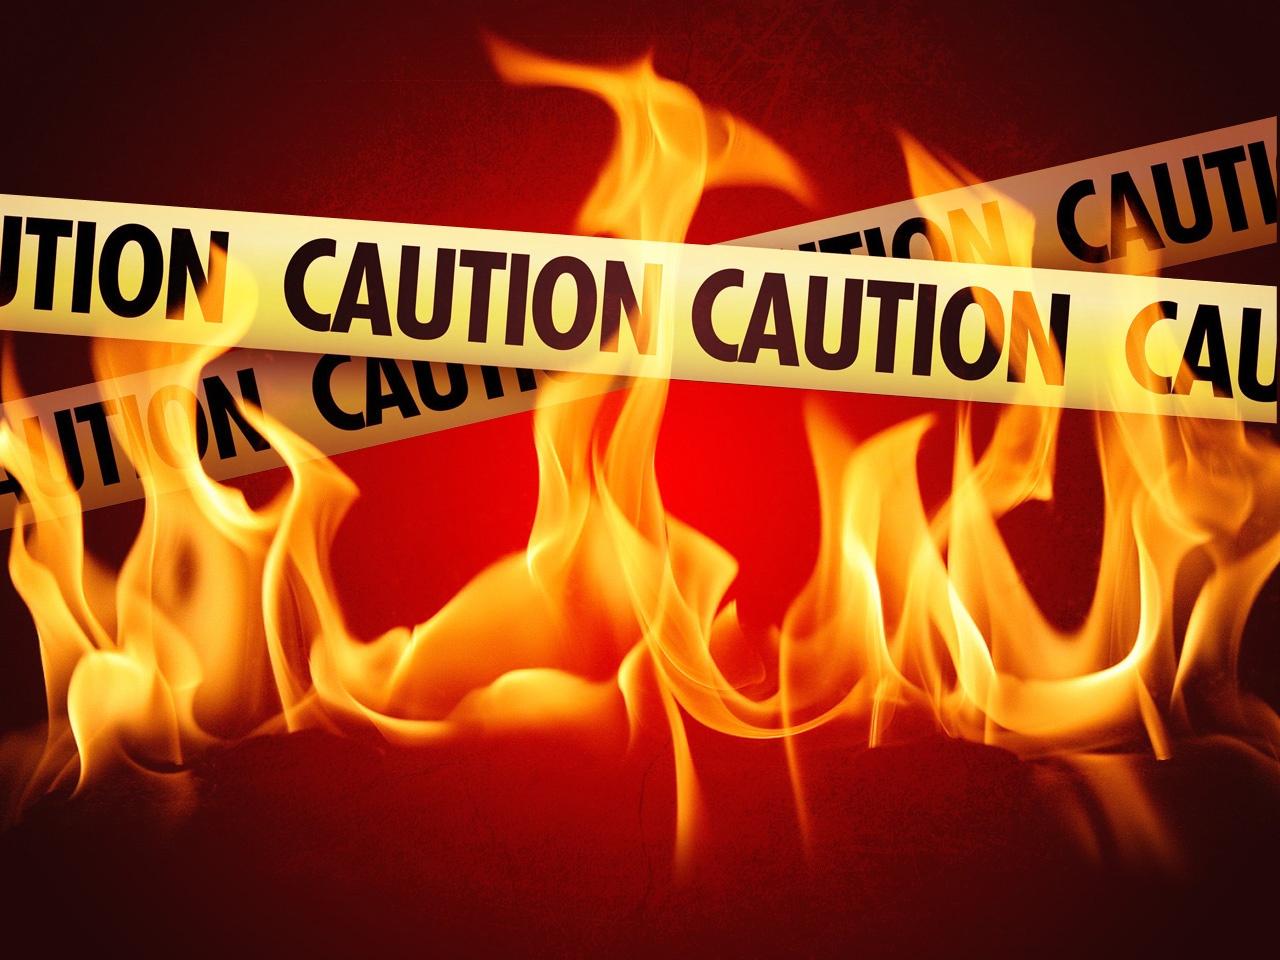 Fire investigation__1545830220375.jpg.jpg